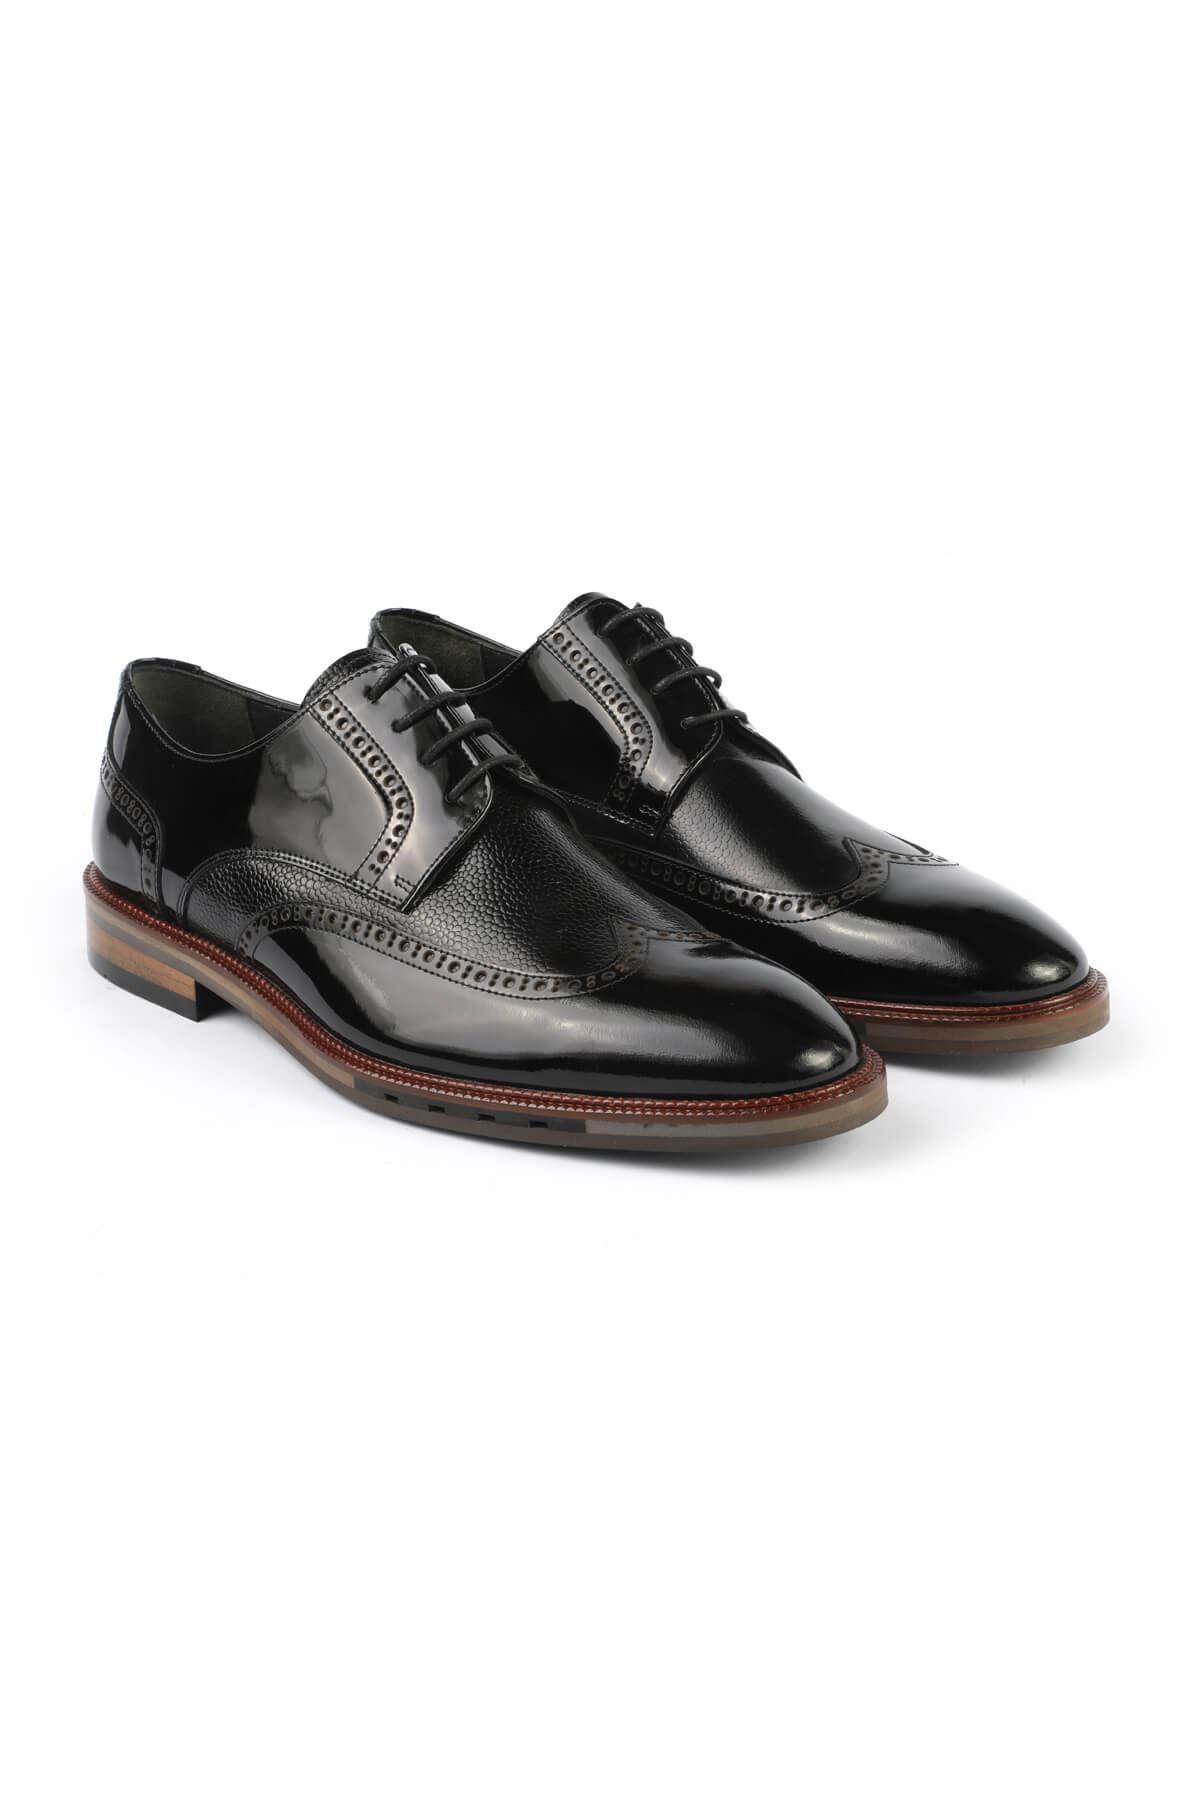 Libero 2352 Black Classic Shoes